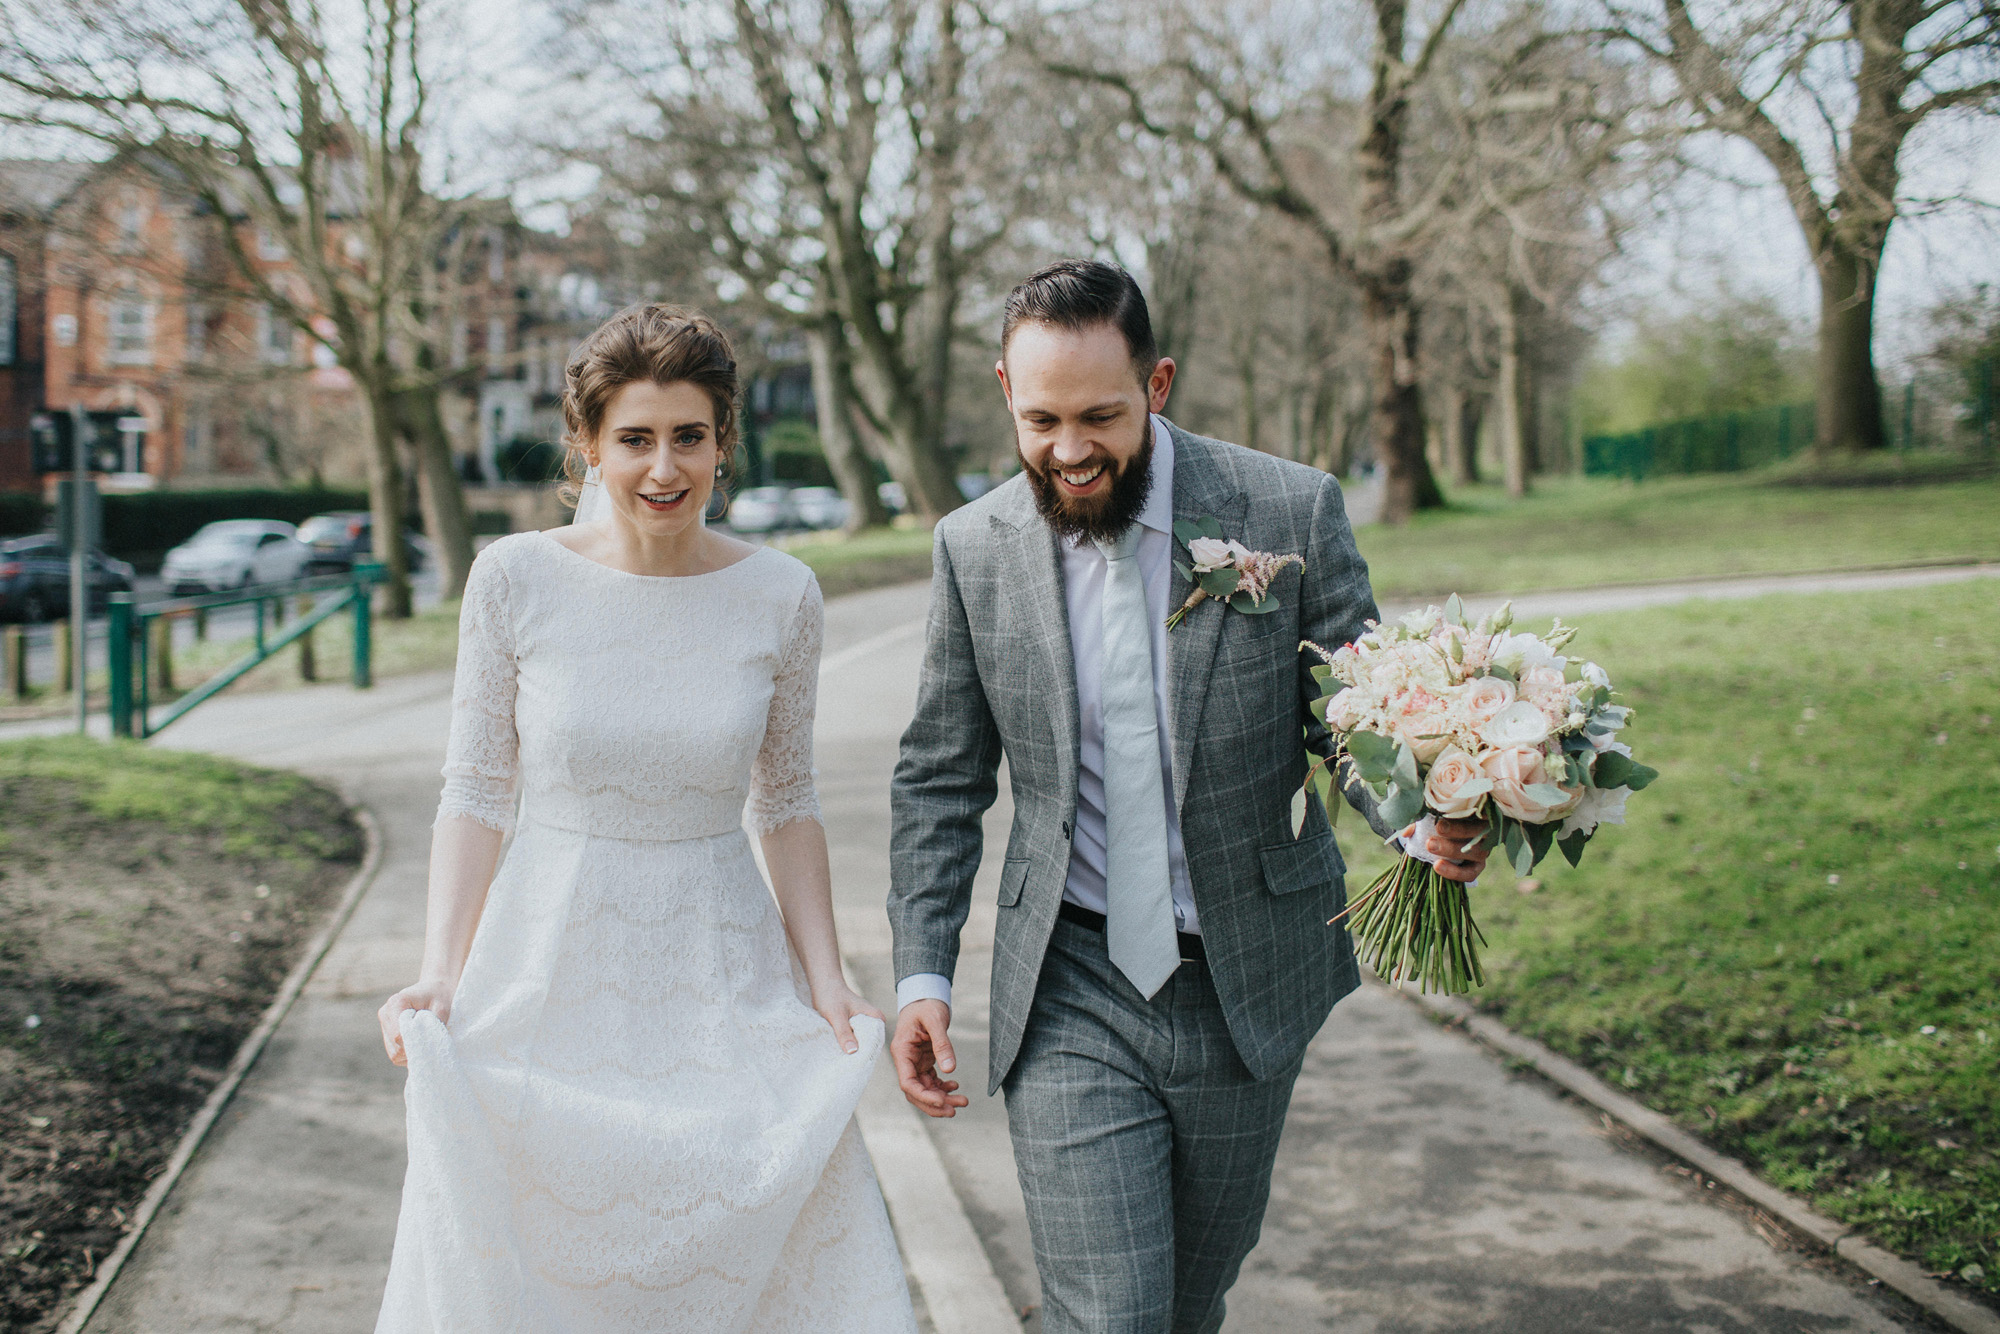 Kate-Beaumont-Lace-Flared-Dahlia-Gown-Leeds-Wedding-Bloom-Weddings-32.jpg